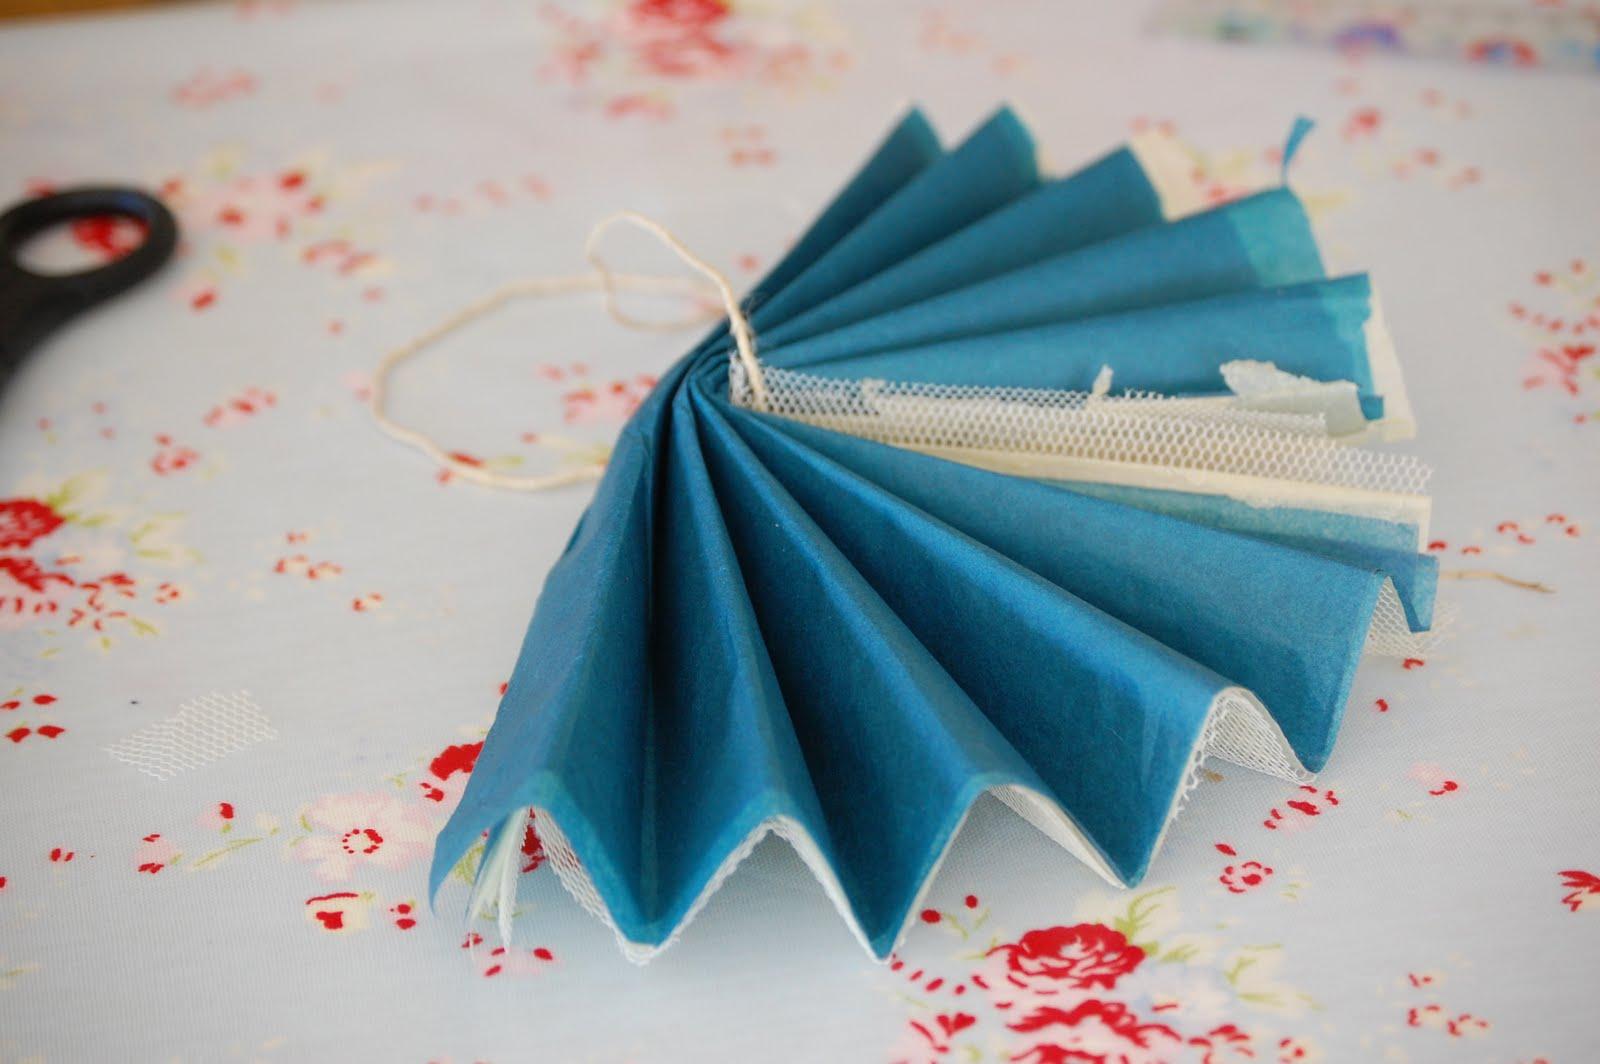 como fazer pompom papel de seda tule decoracao festa aniversario batizado casamento cha de bebe (3)